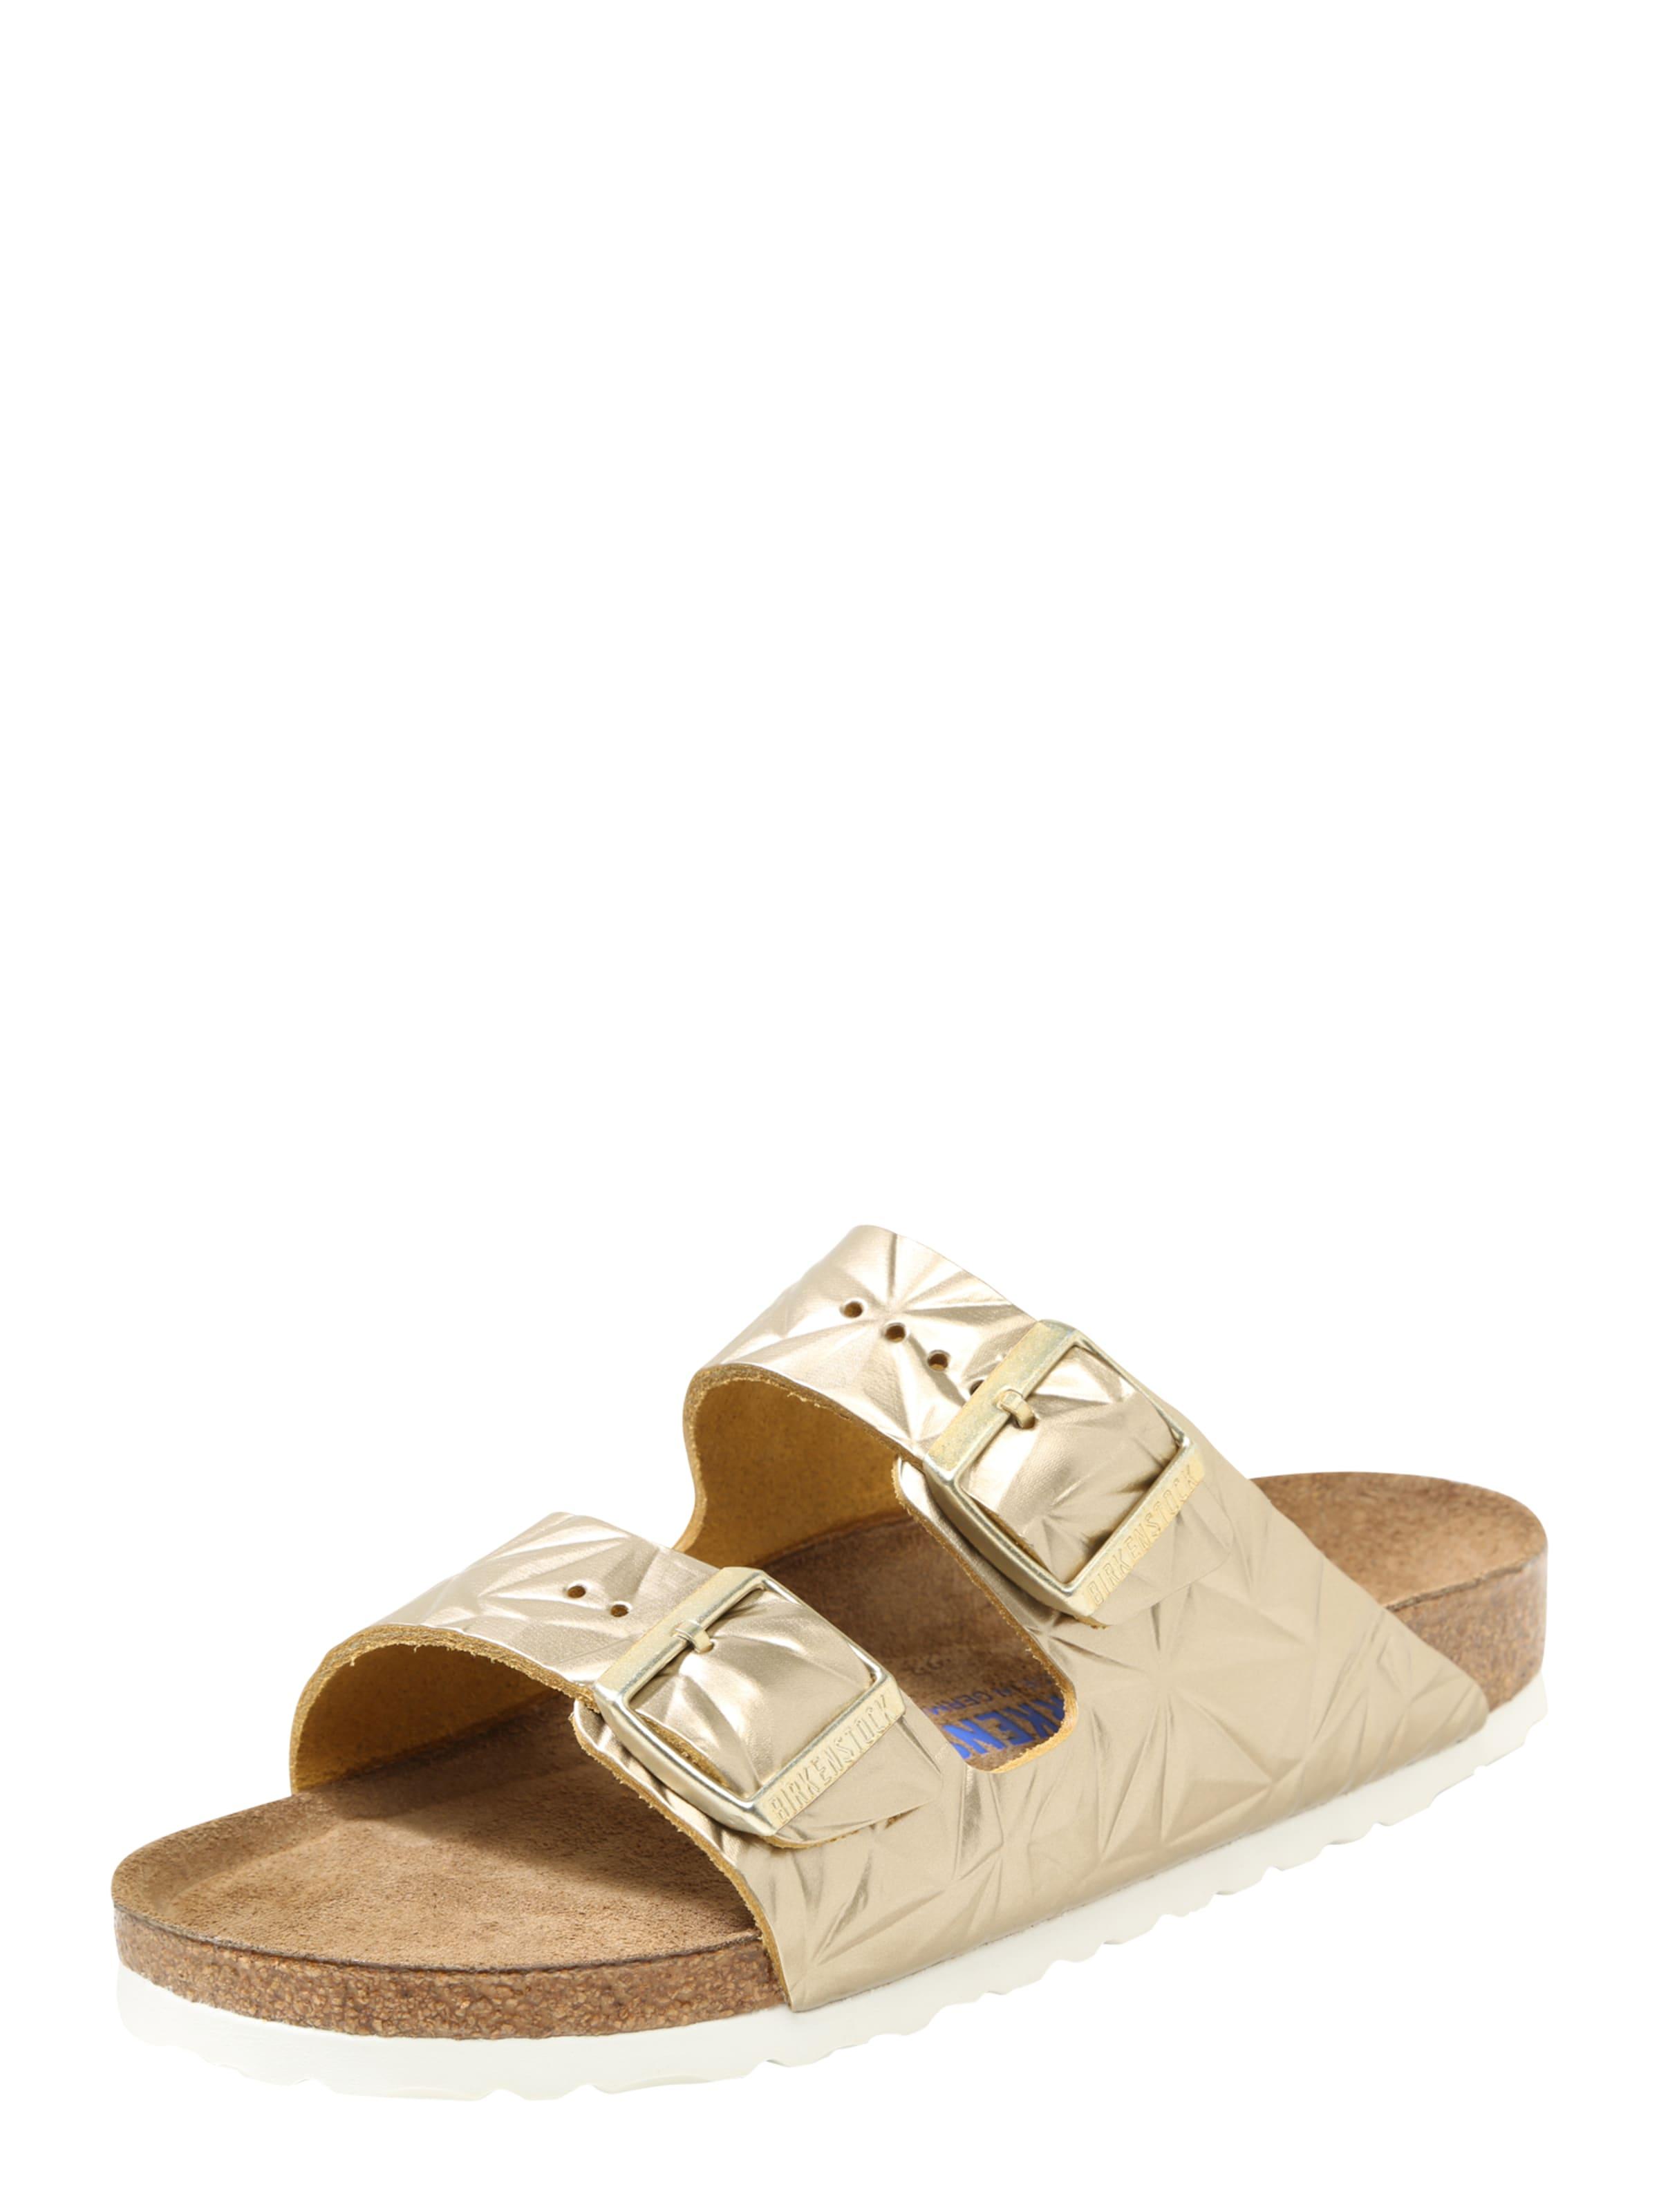 BIRKENSTOCK Sandalen Arizona SFB Verschleißfeste billige Schuhe